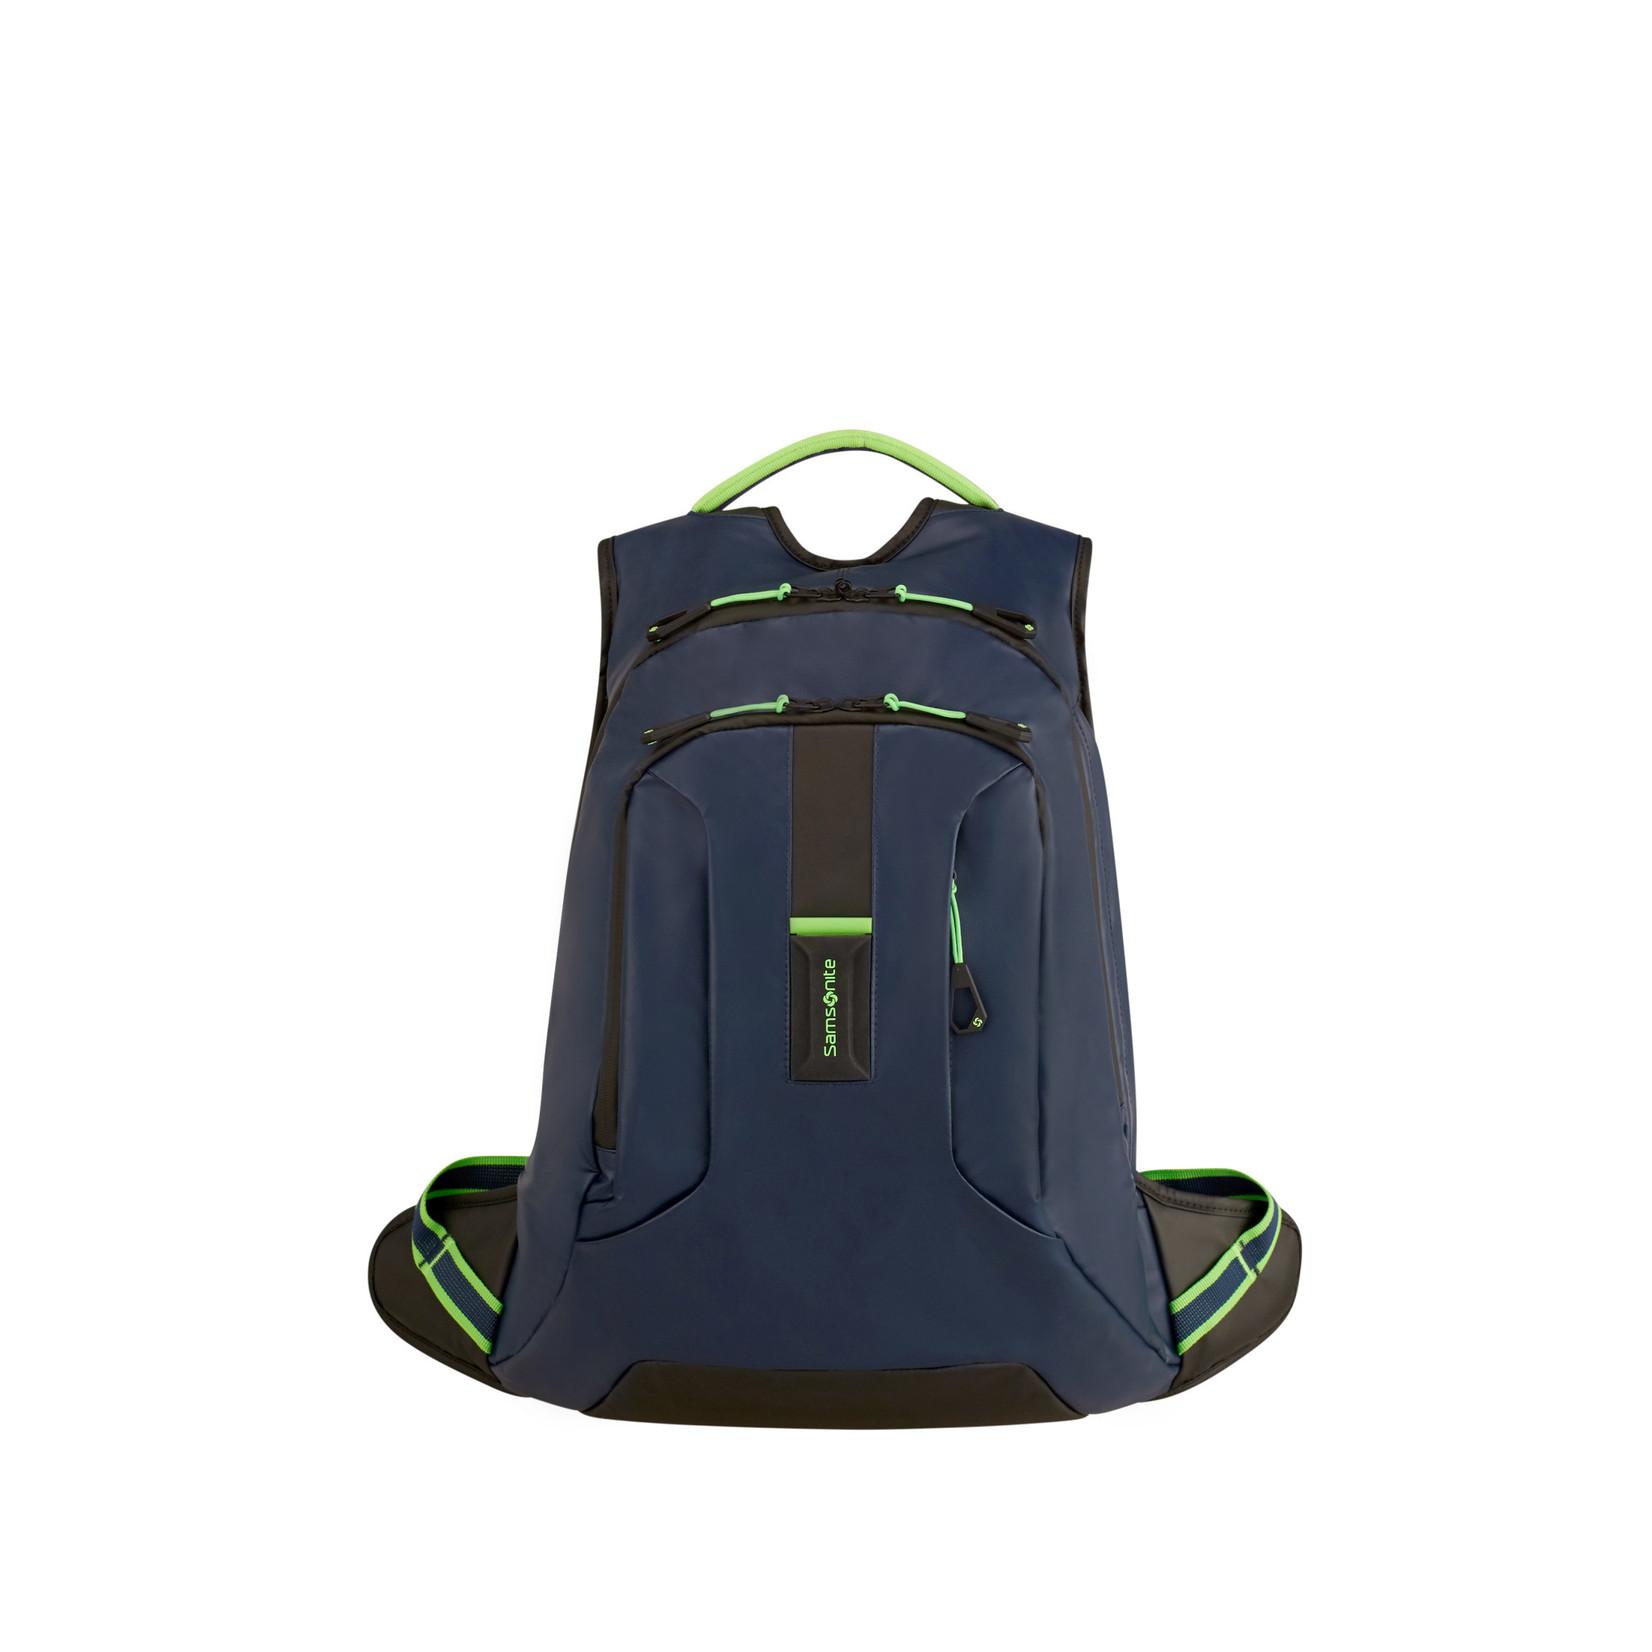 Samsonite Laptoprugtas Paradiver Light Blue-Green L